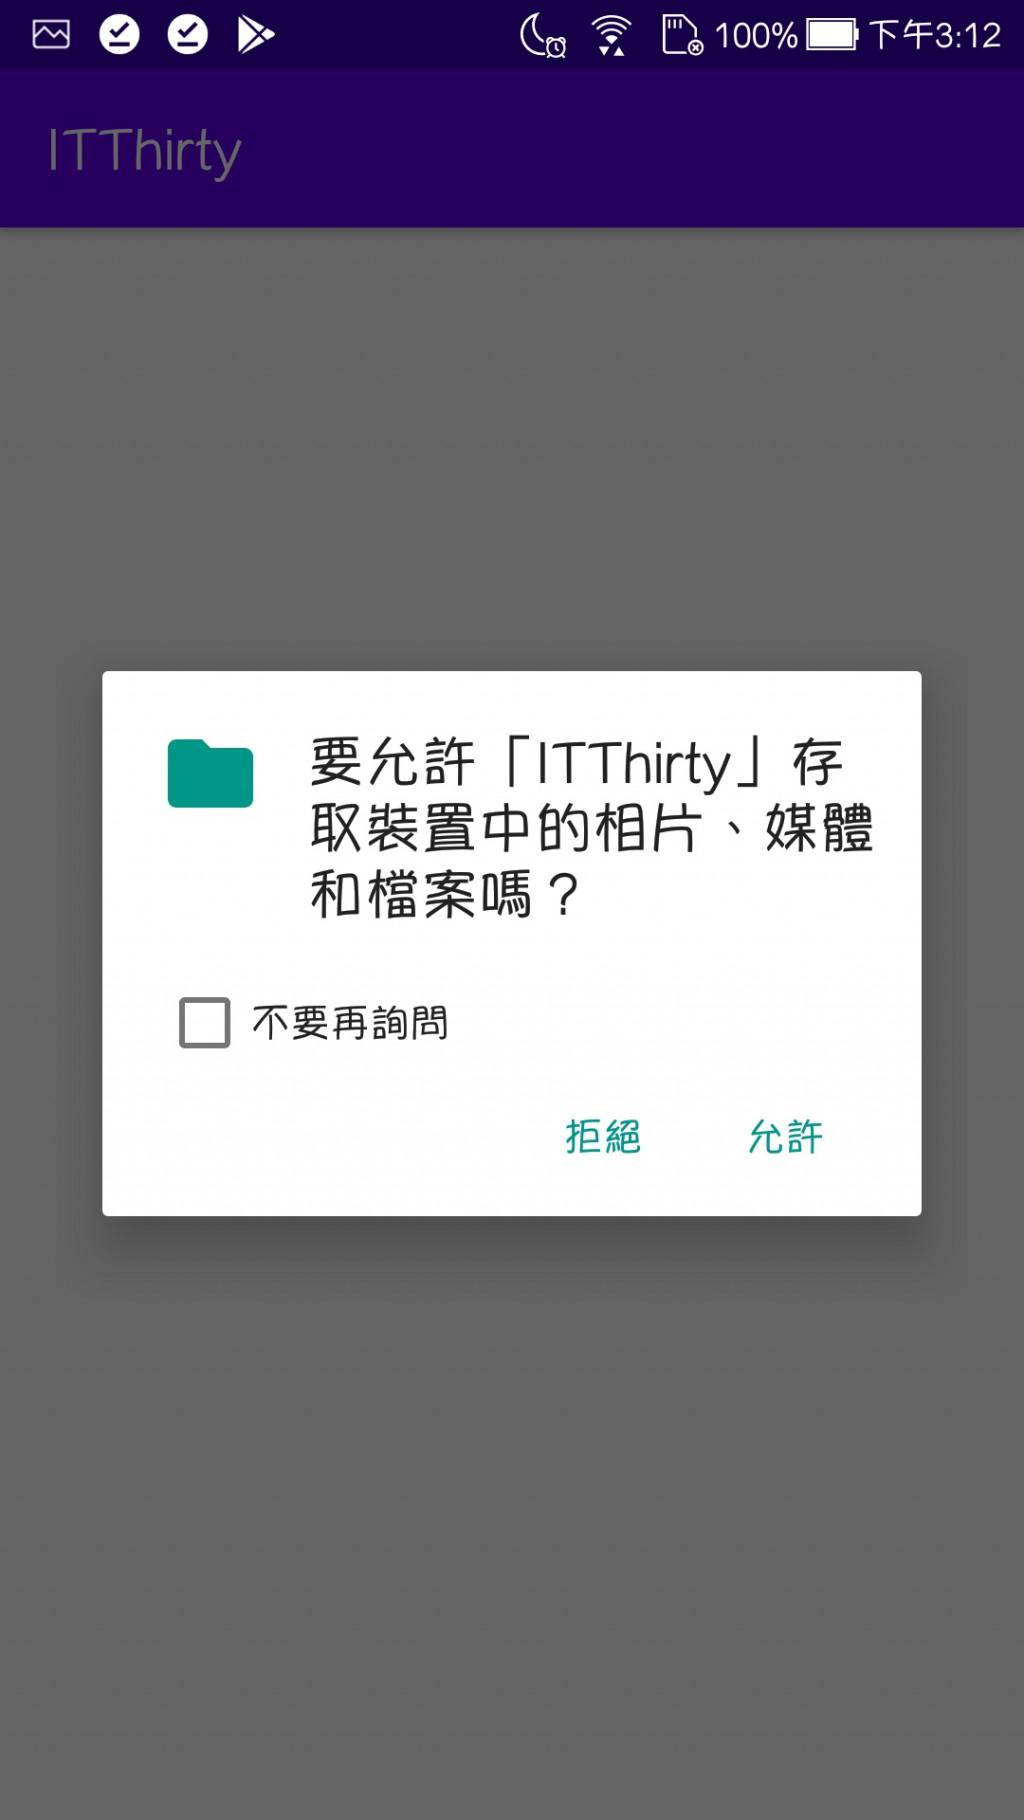 https://ithelp.ithome.com.tw/upload/images/20200914/20129524xBu7jPuWGd.jpg